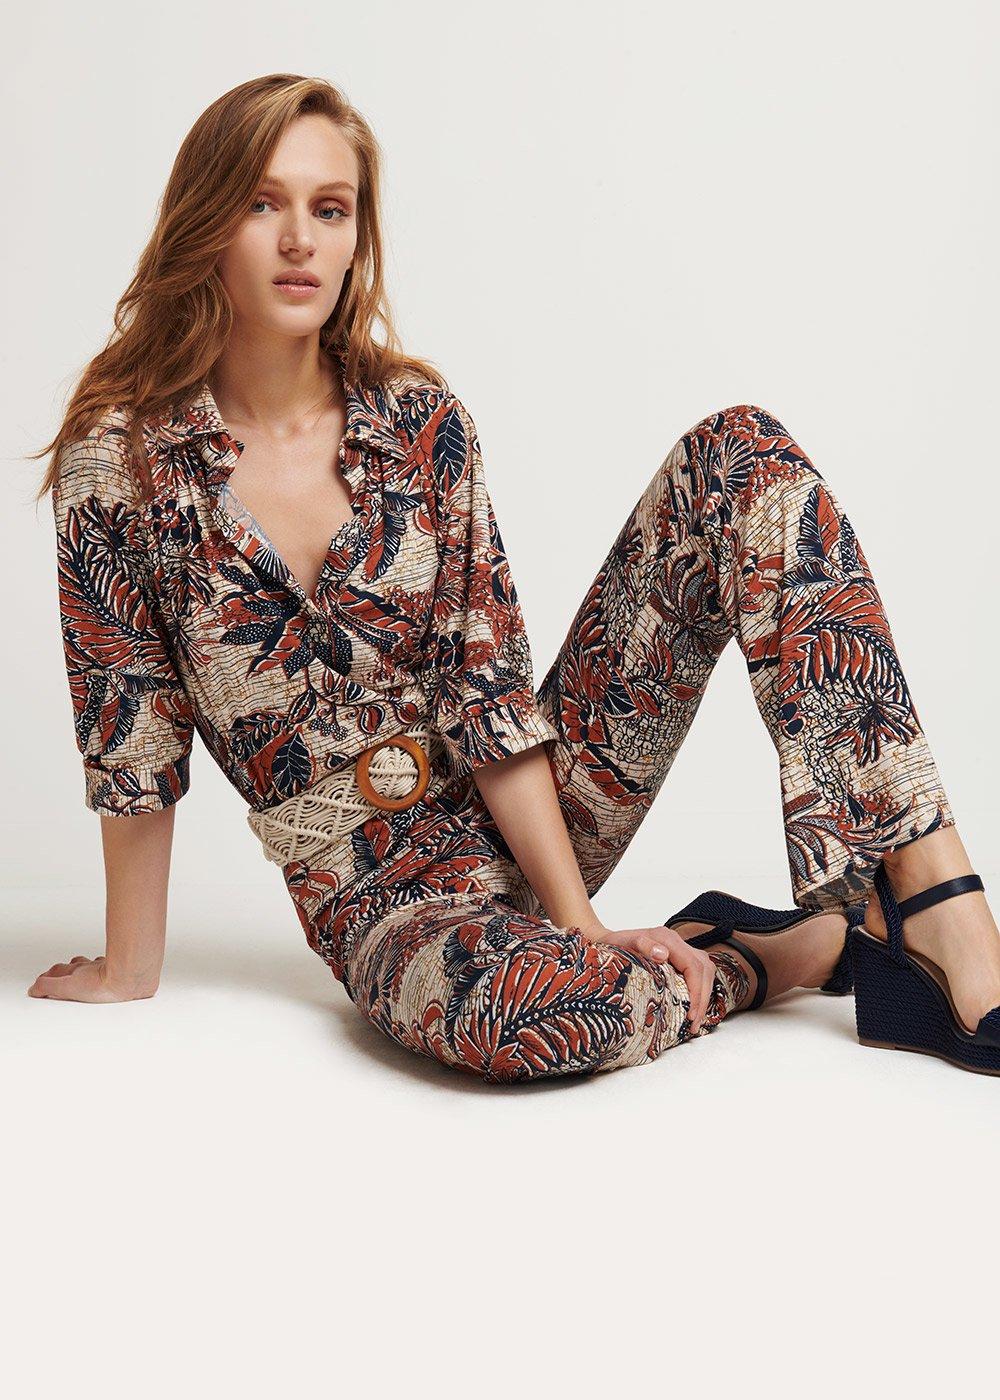 Sammy patterned T-shirt - L.beige \ cannella Fantasia - Woman